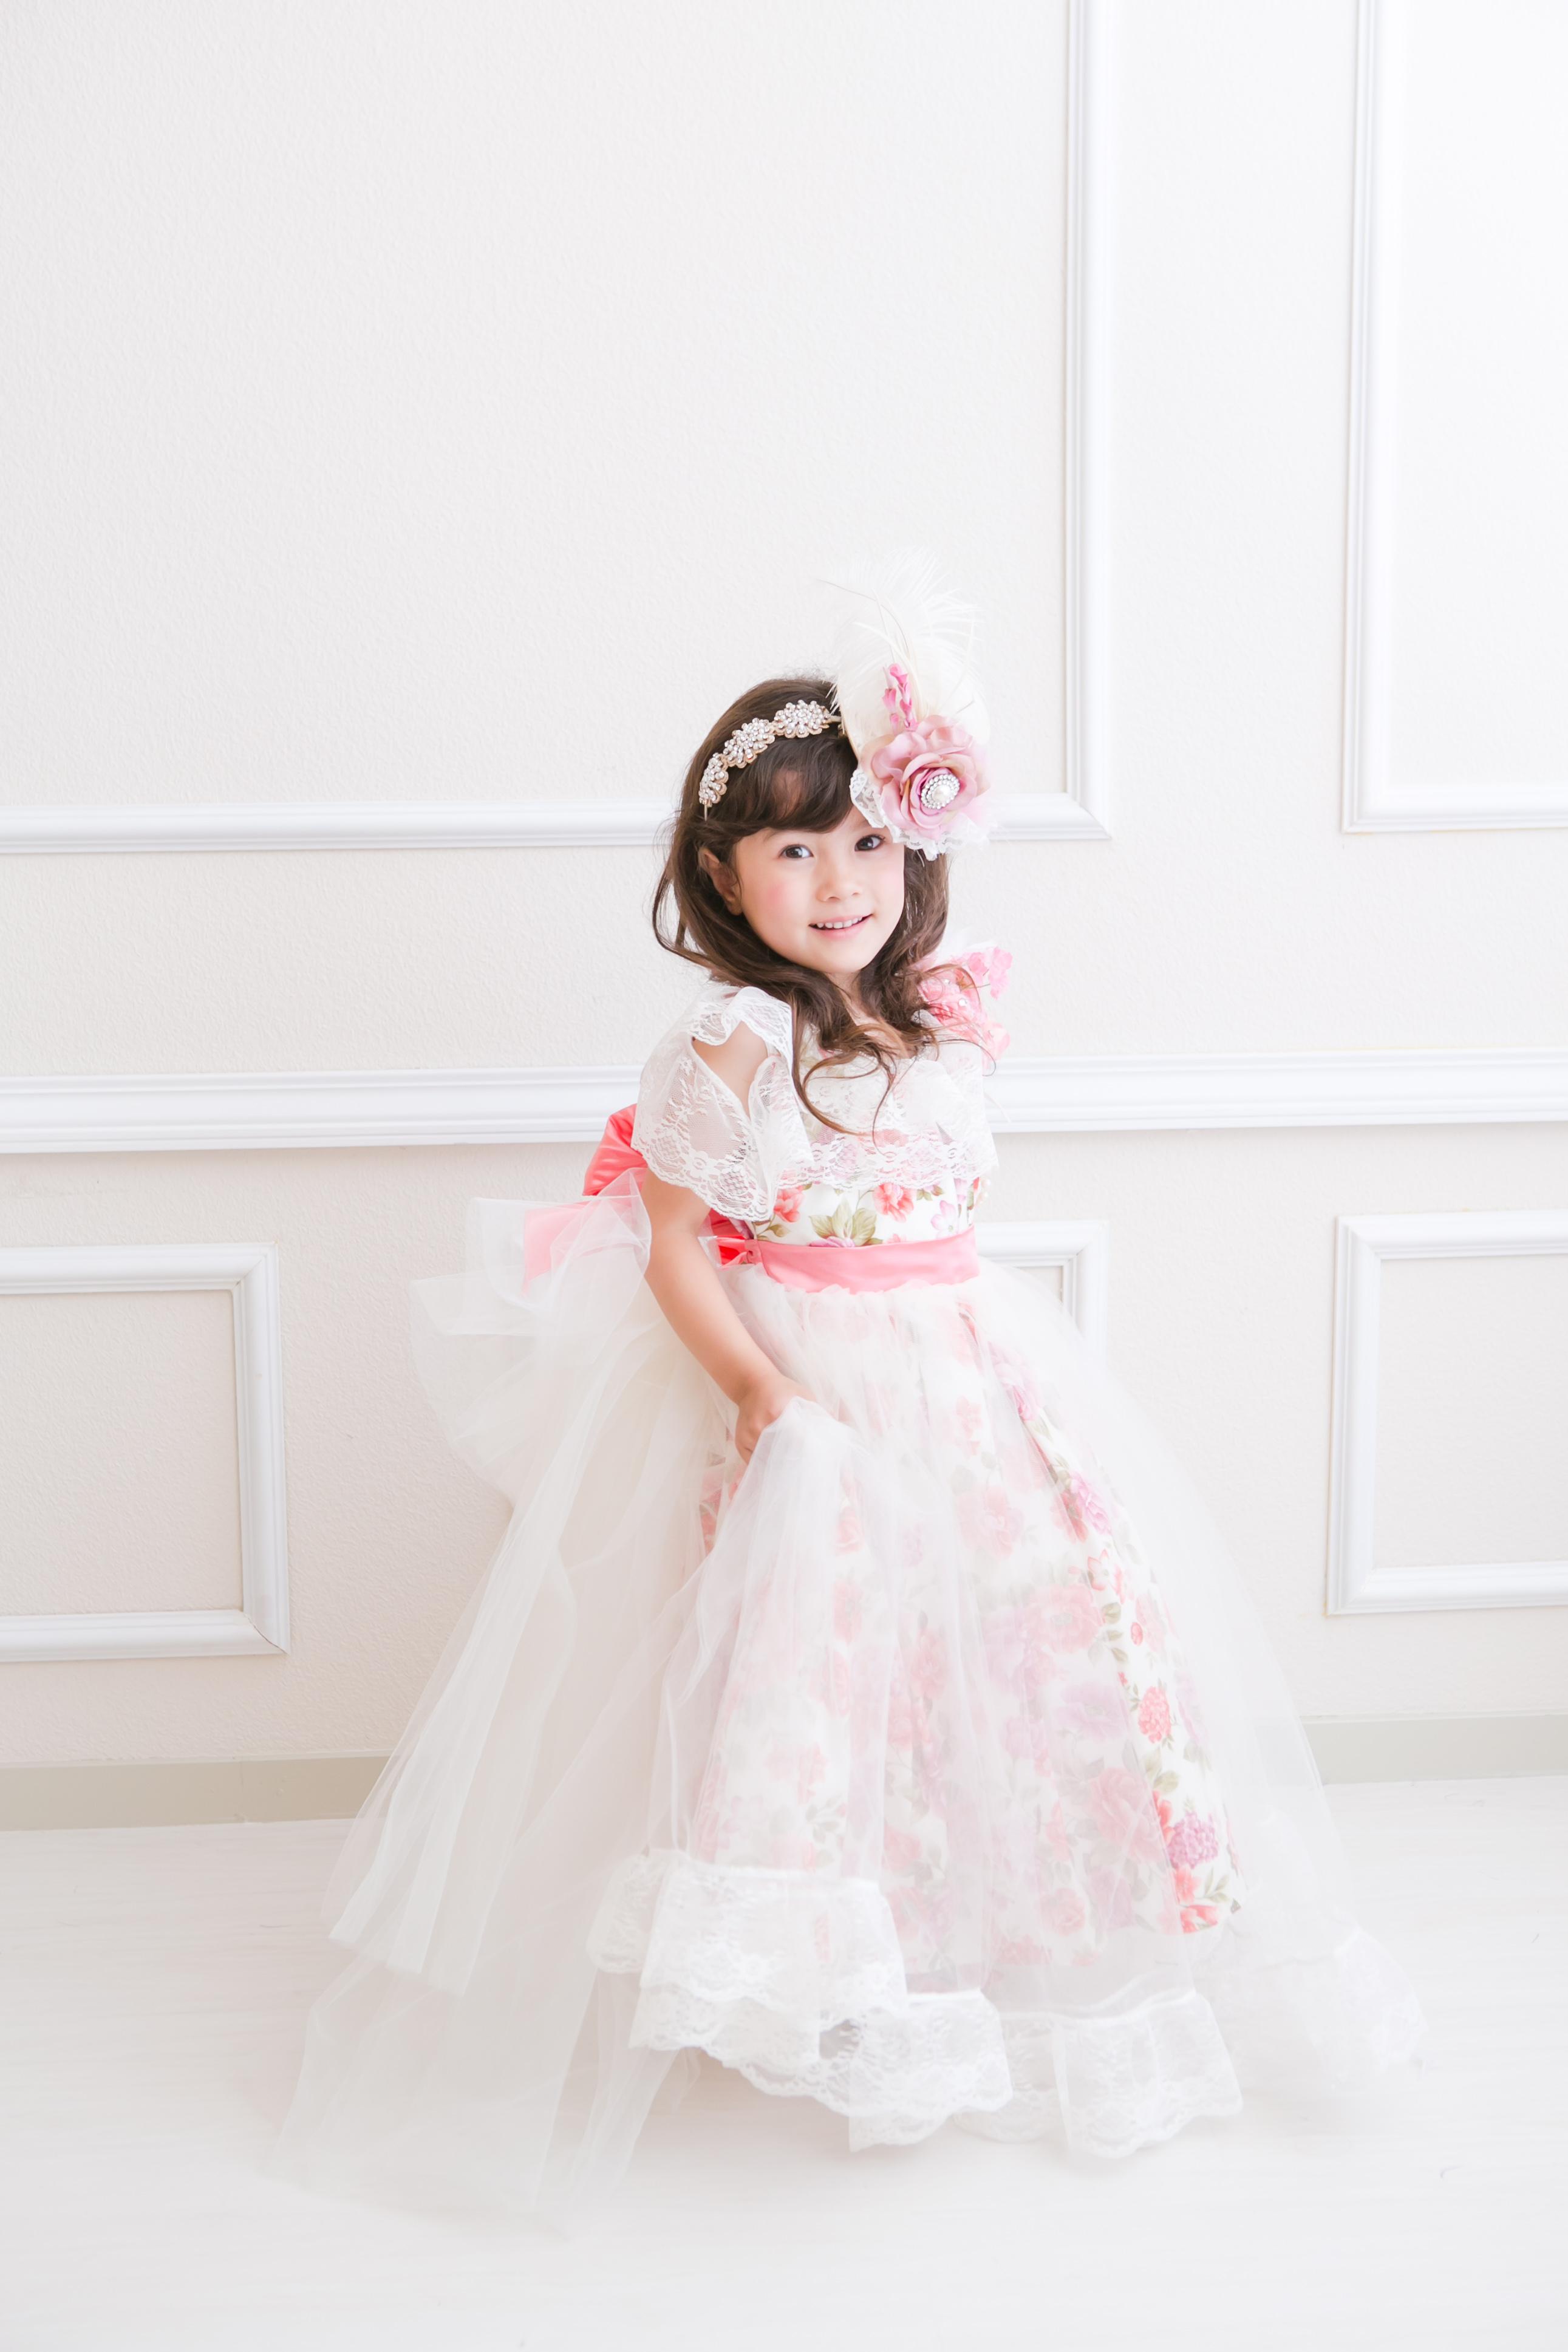 micia my dress mikoto